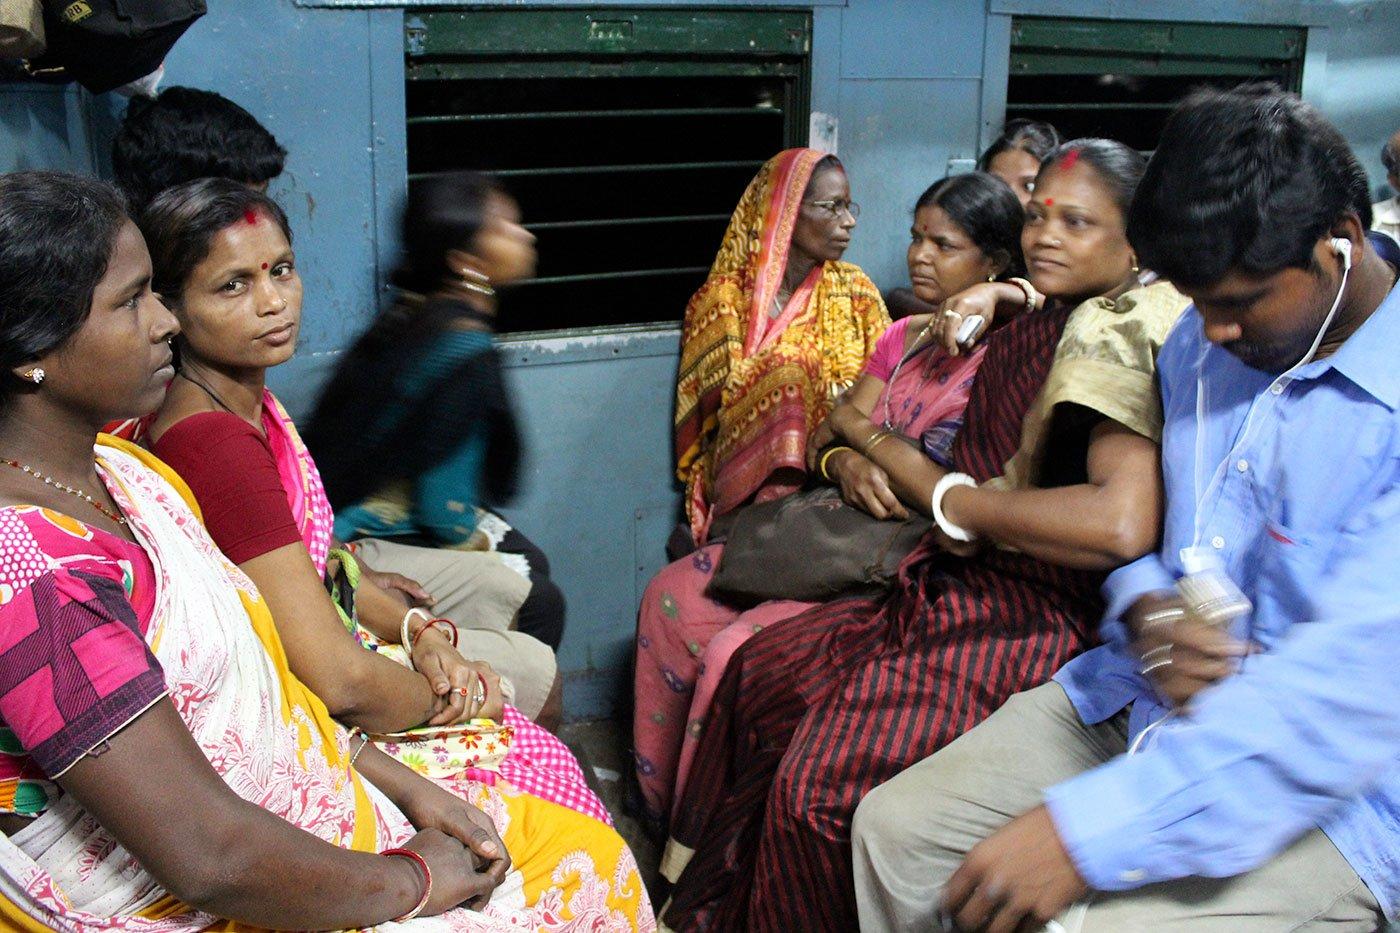 Breshpati Sardar sitting in the train early in the morning